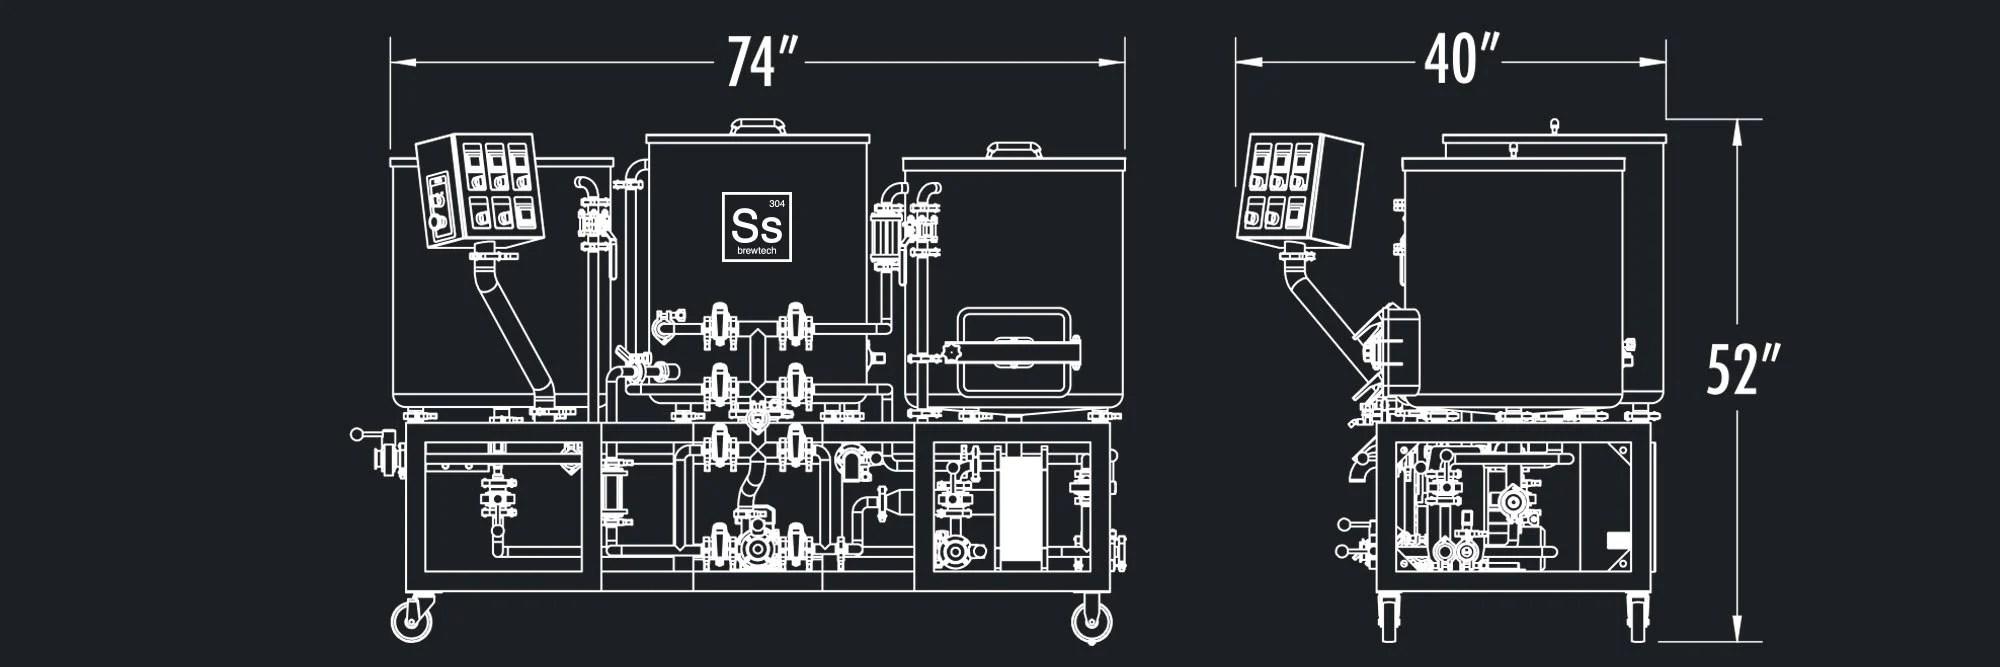 medium resolution of nano breweries using ss gear